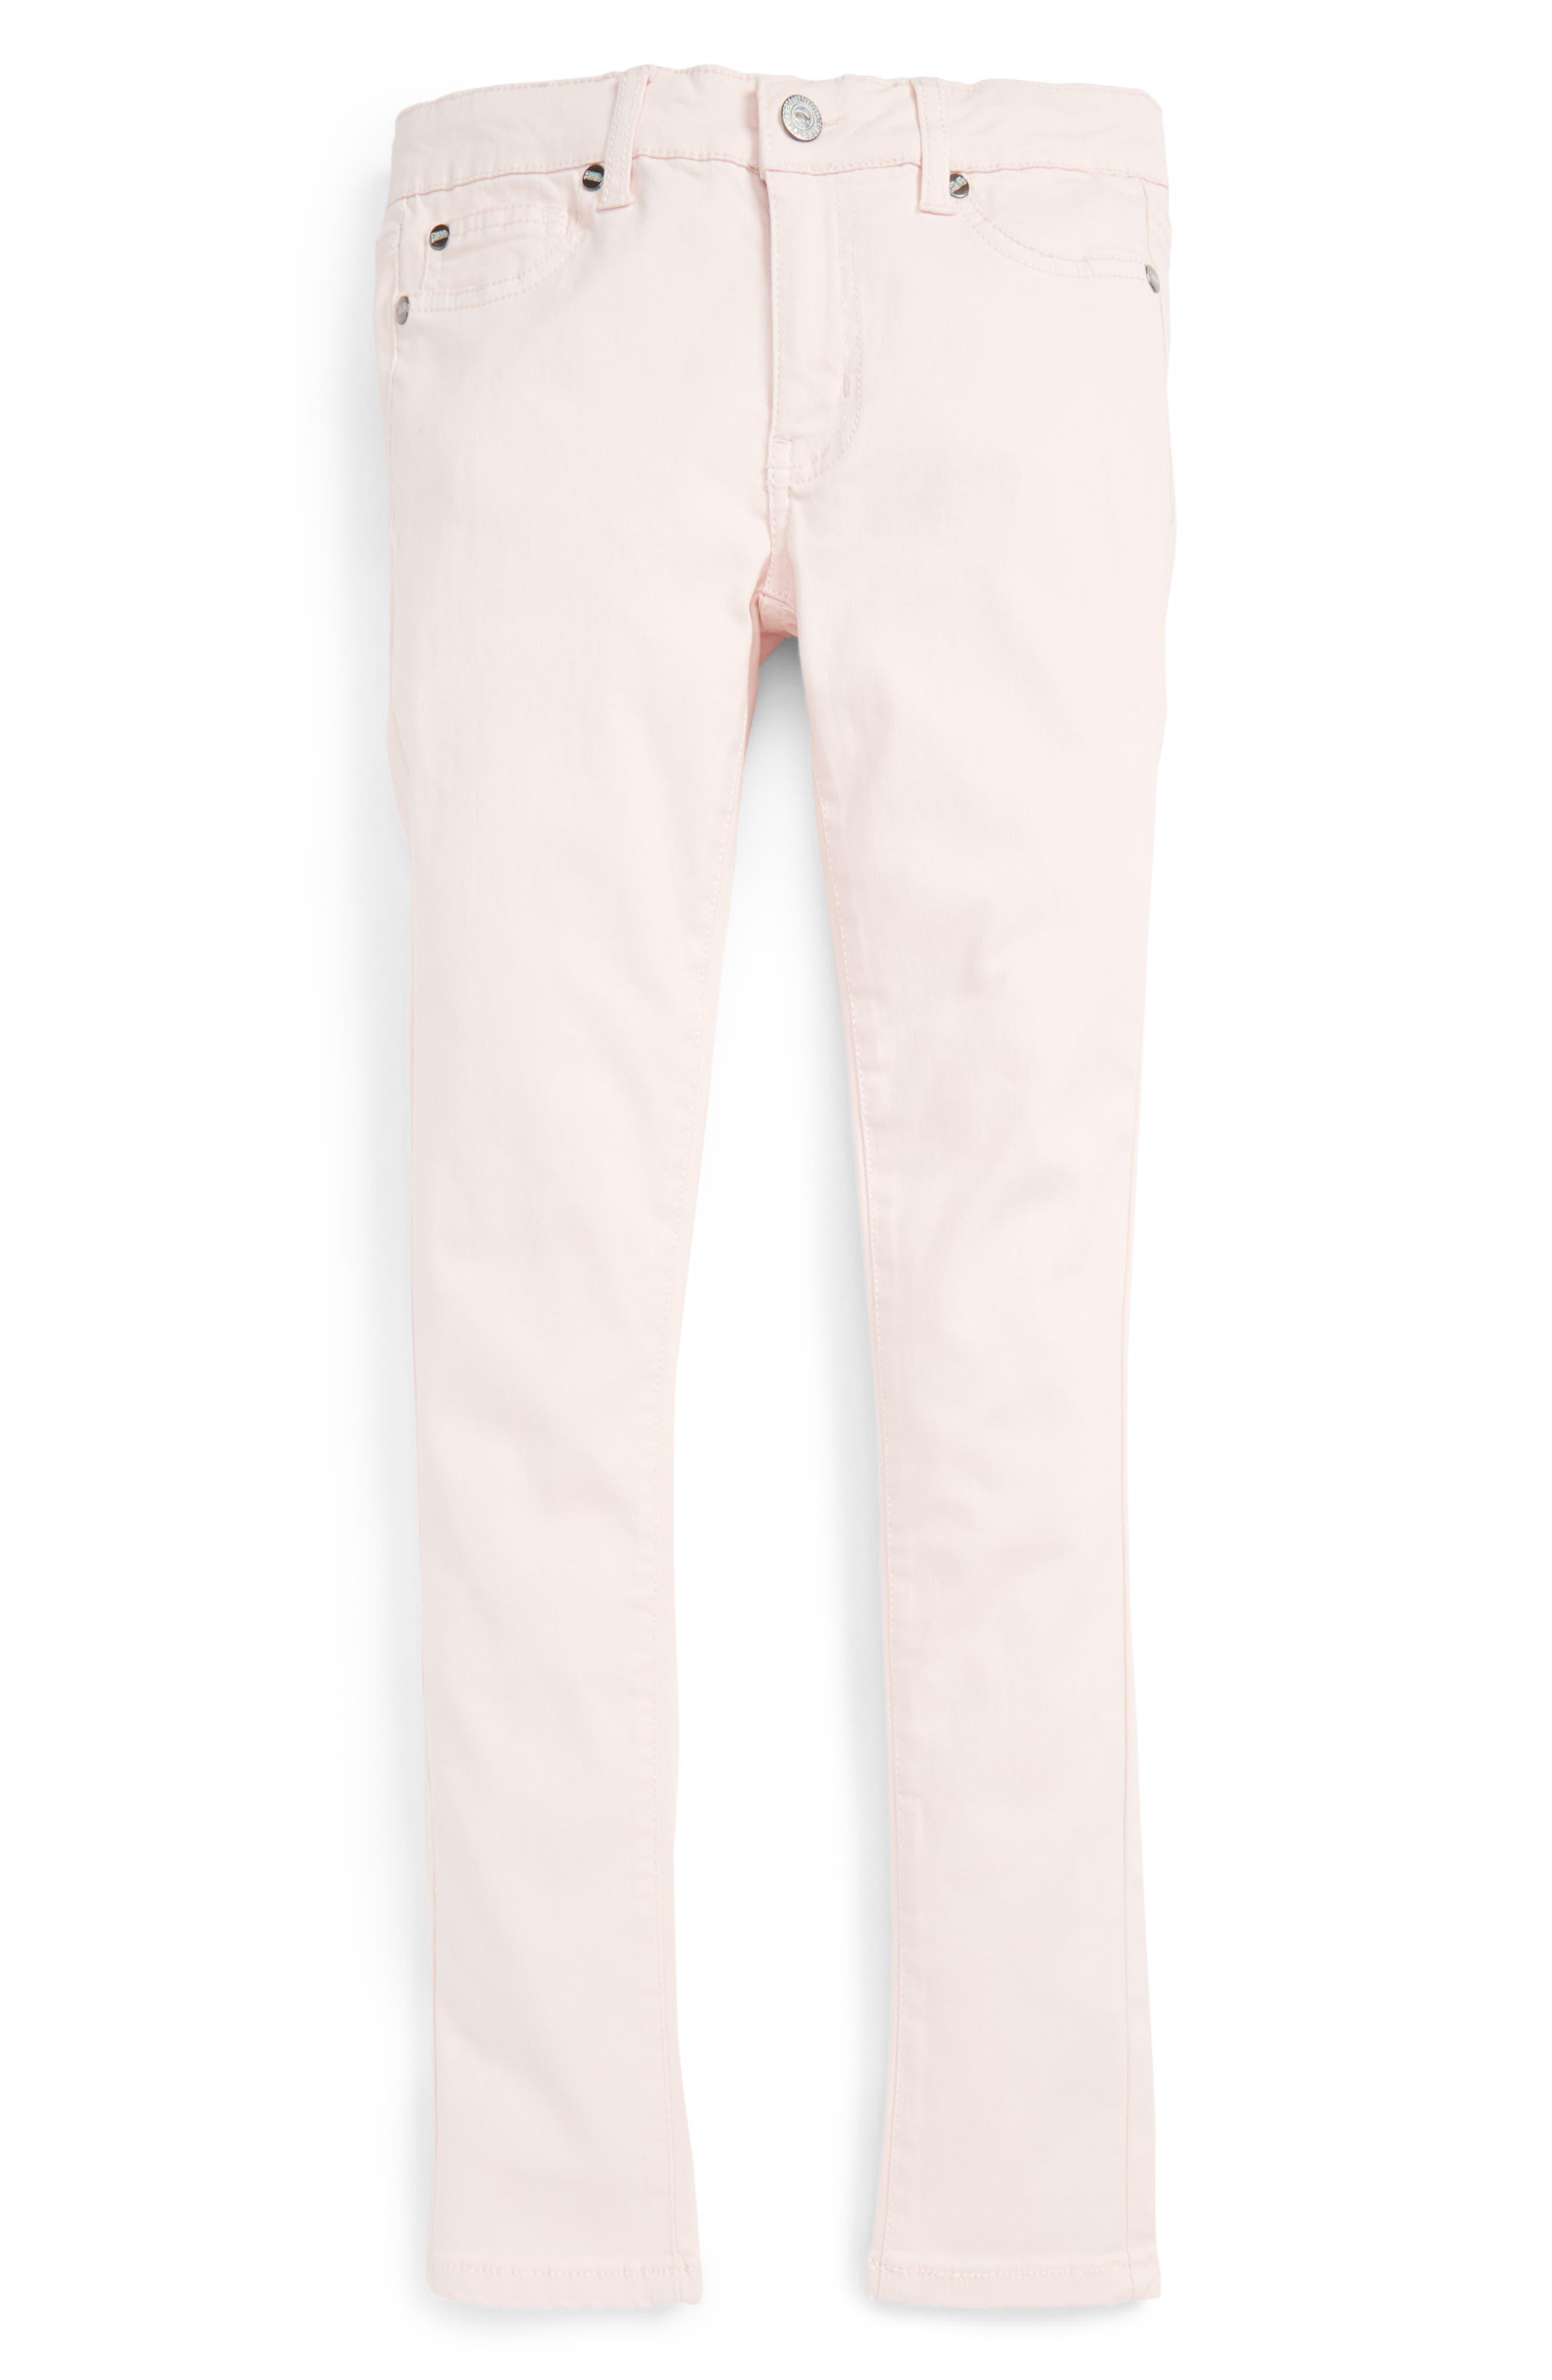 PEEK Taylor Skinny Jeans